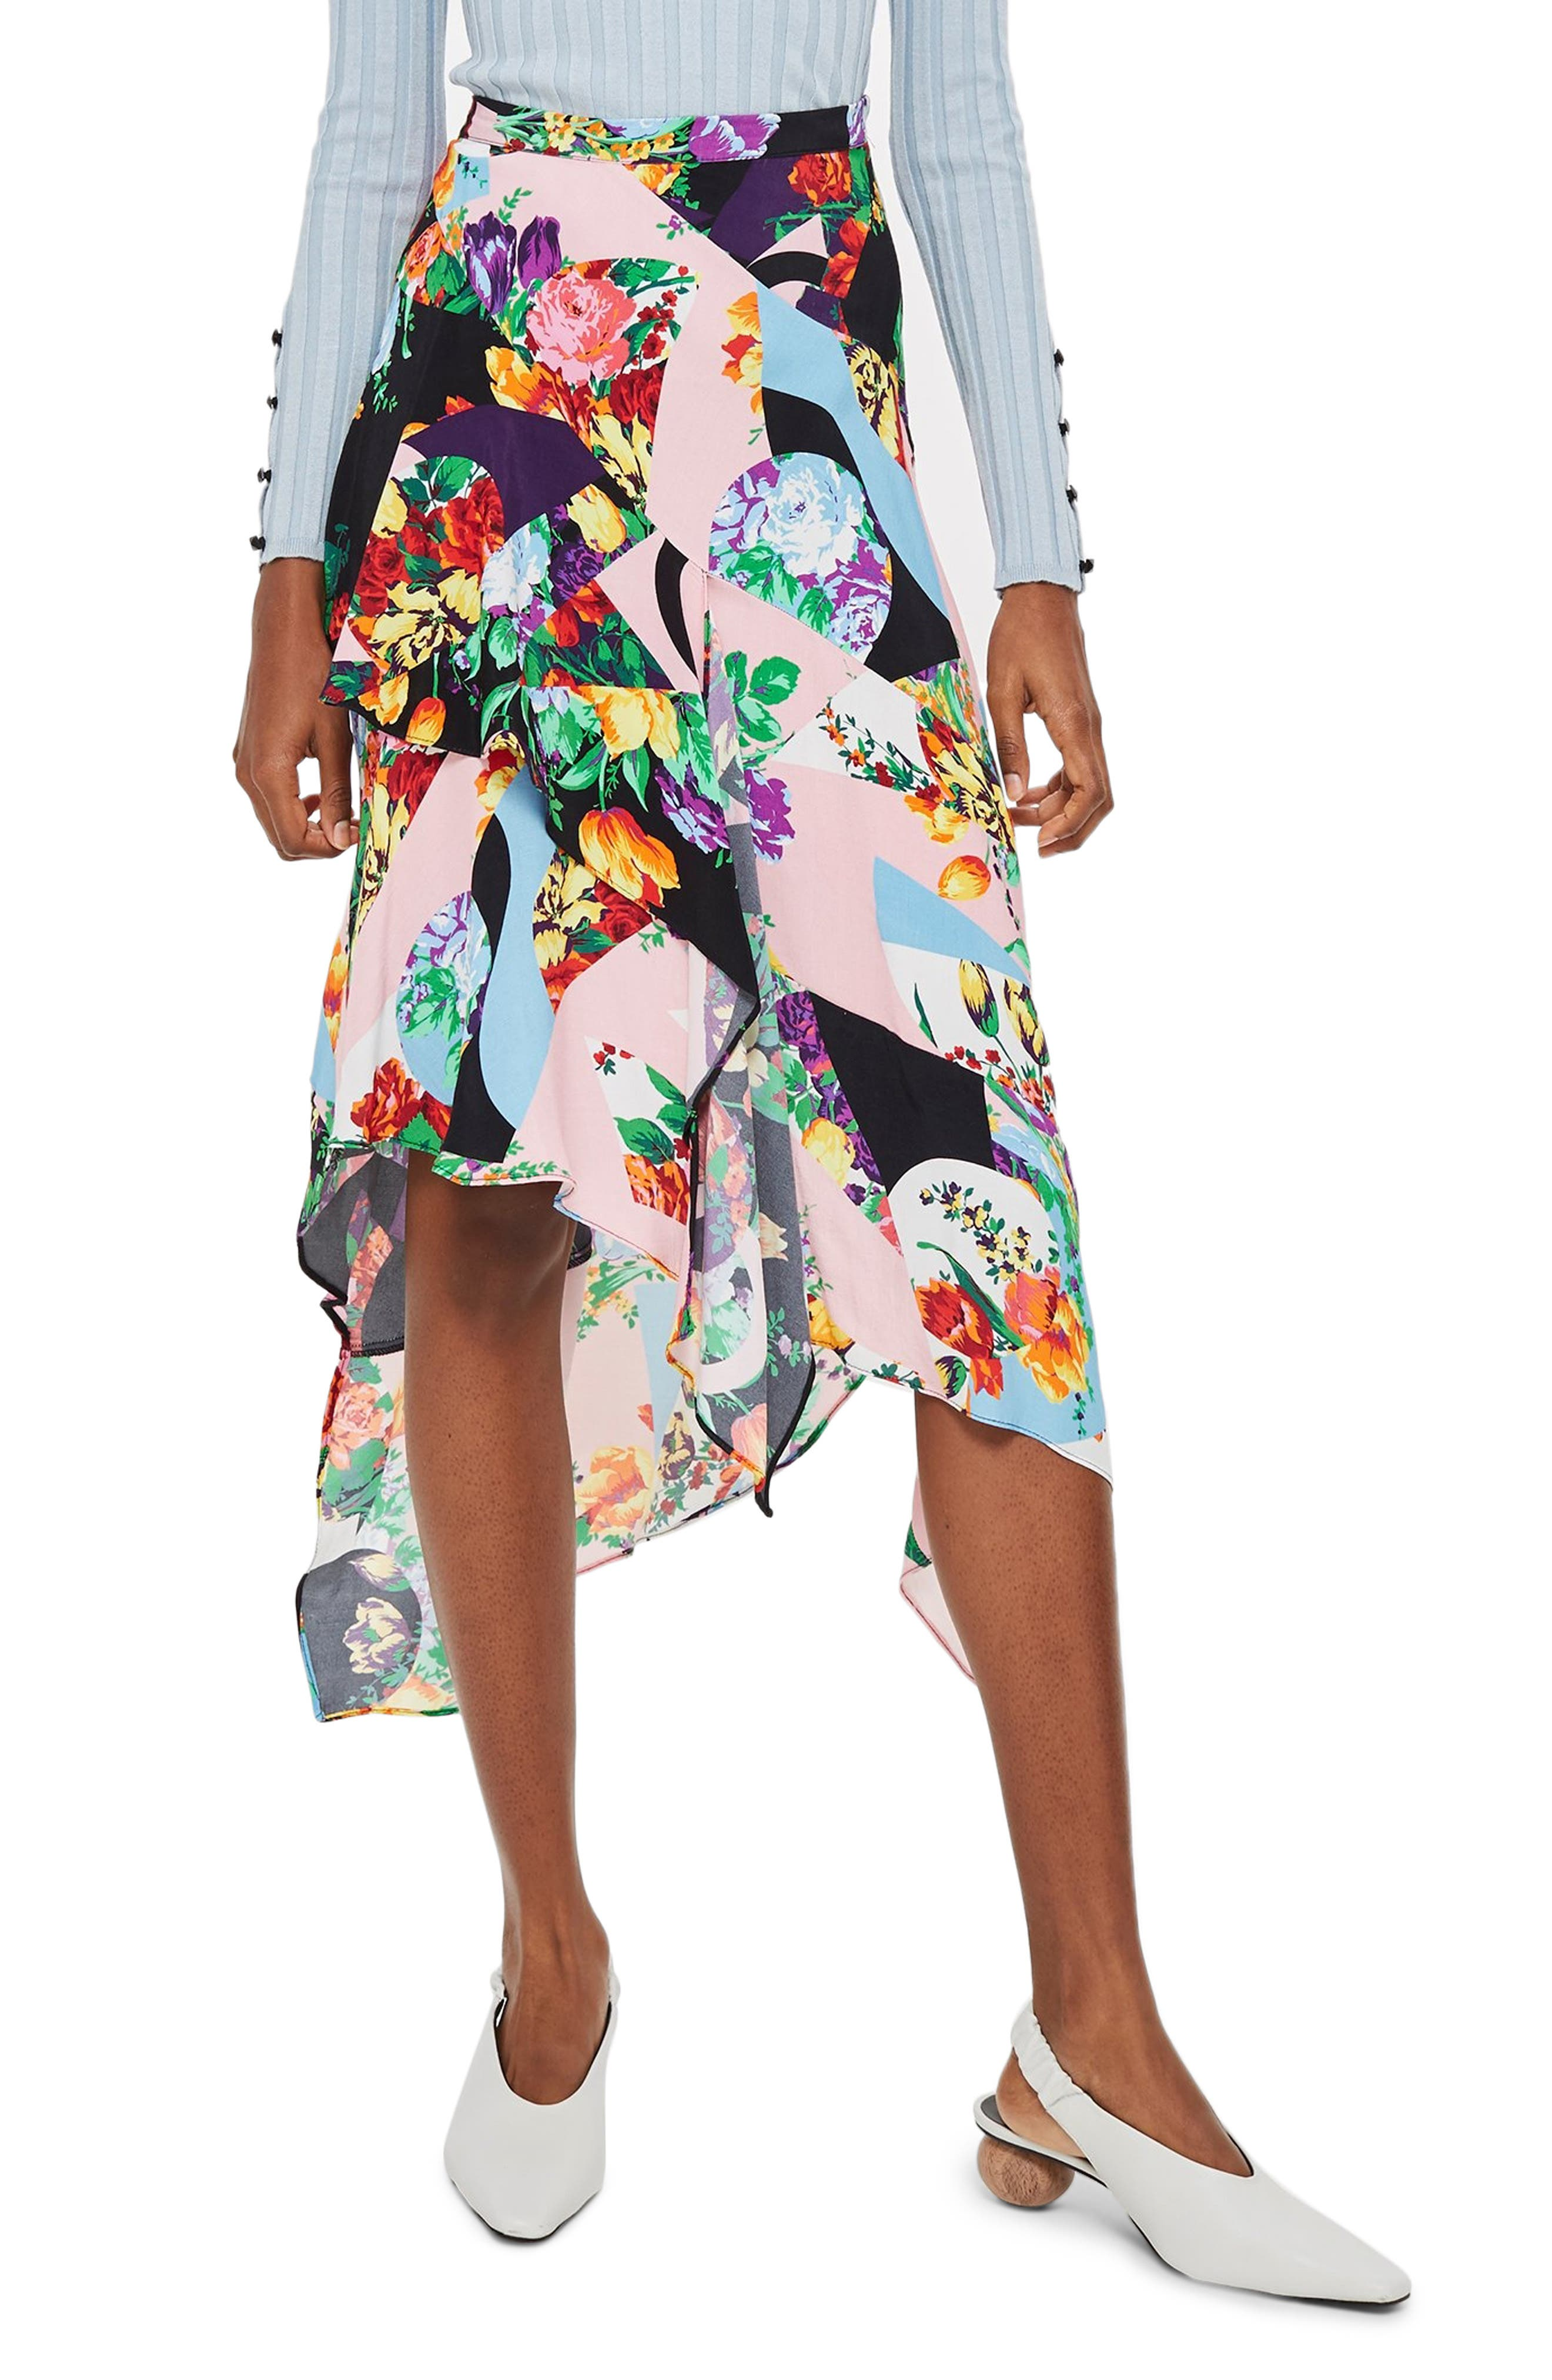 Topshop Spliced Floral Print Midi Skirt, US (fits like 0) - Pink